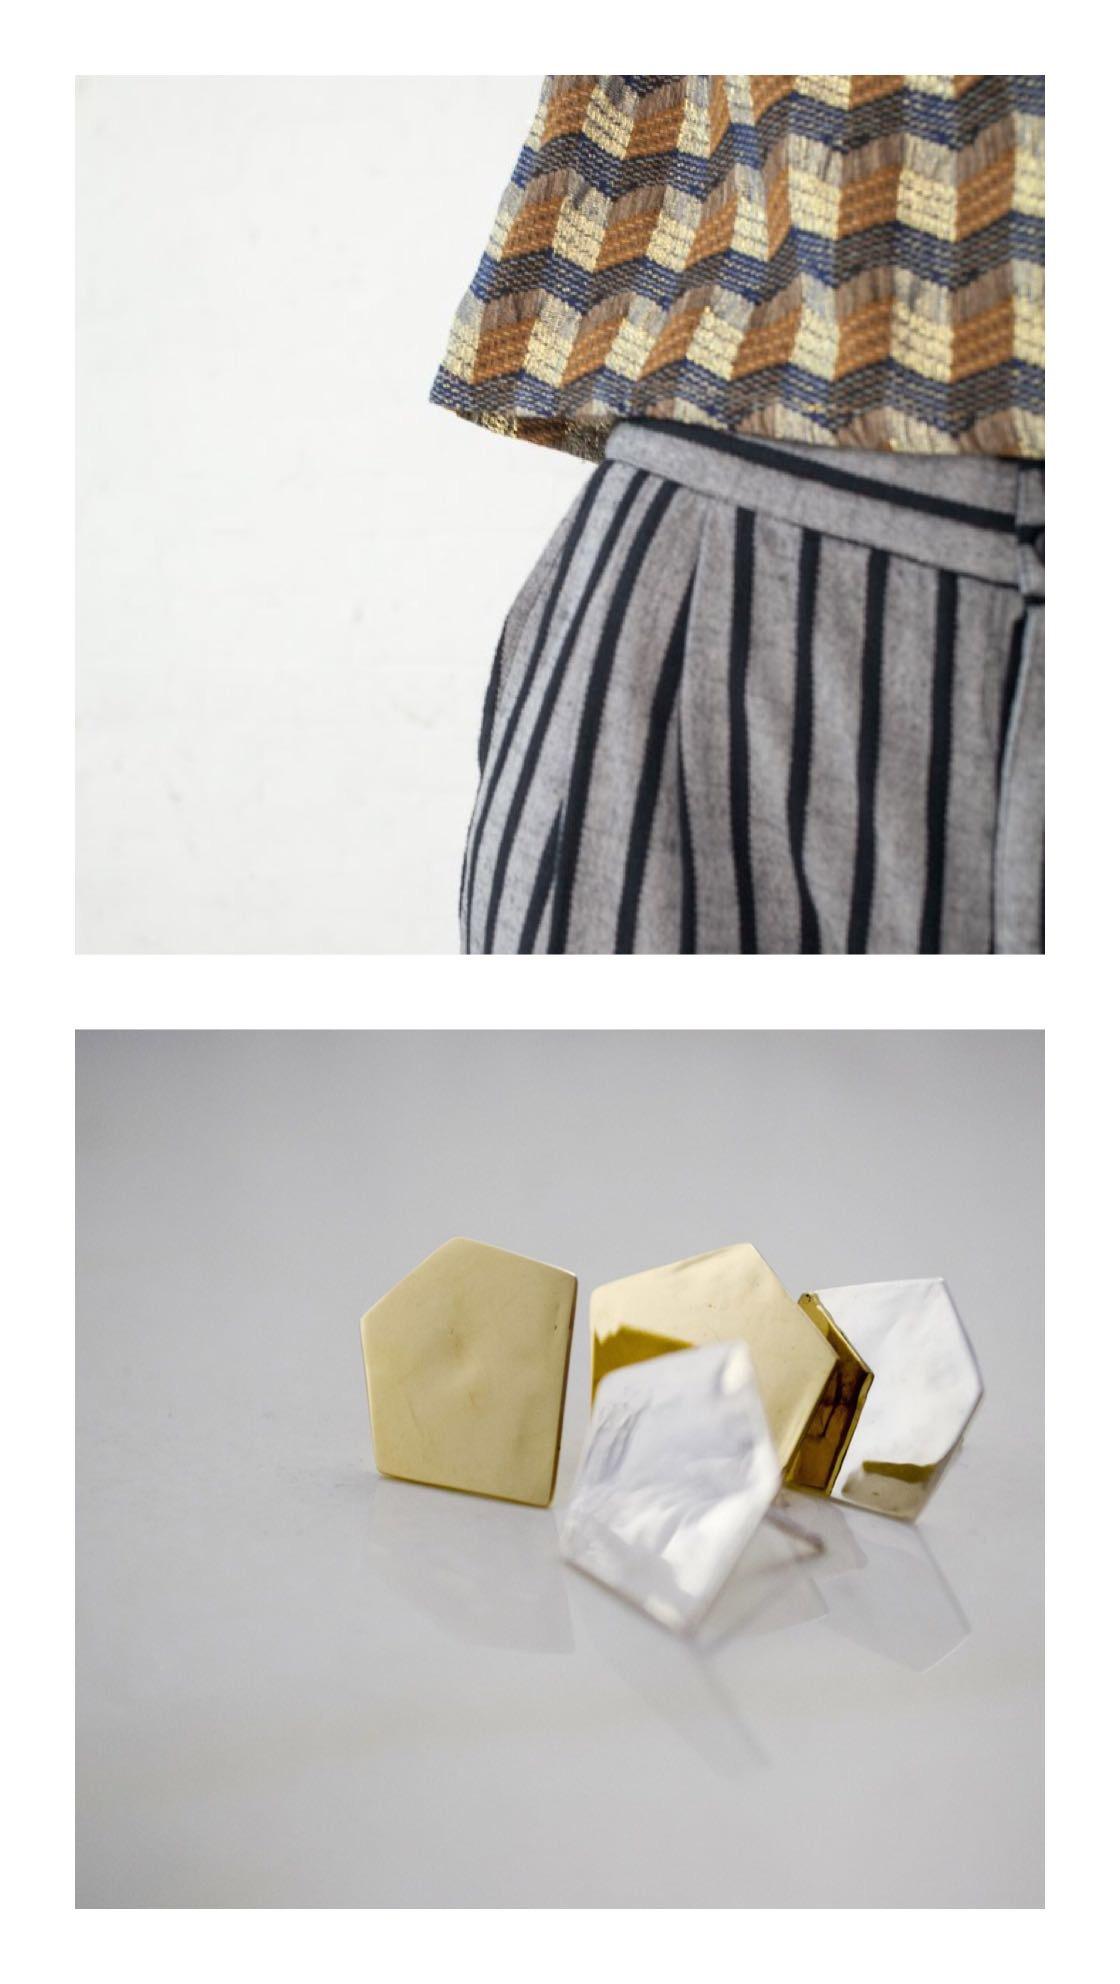 *Ace&Jig trousers   |  Penta Earrings, 14K and Sterling Silver.